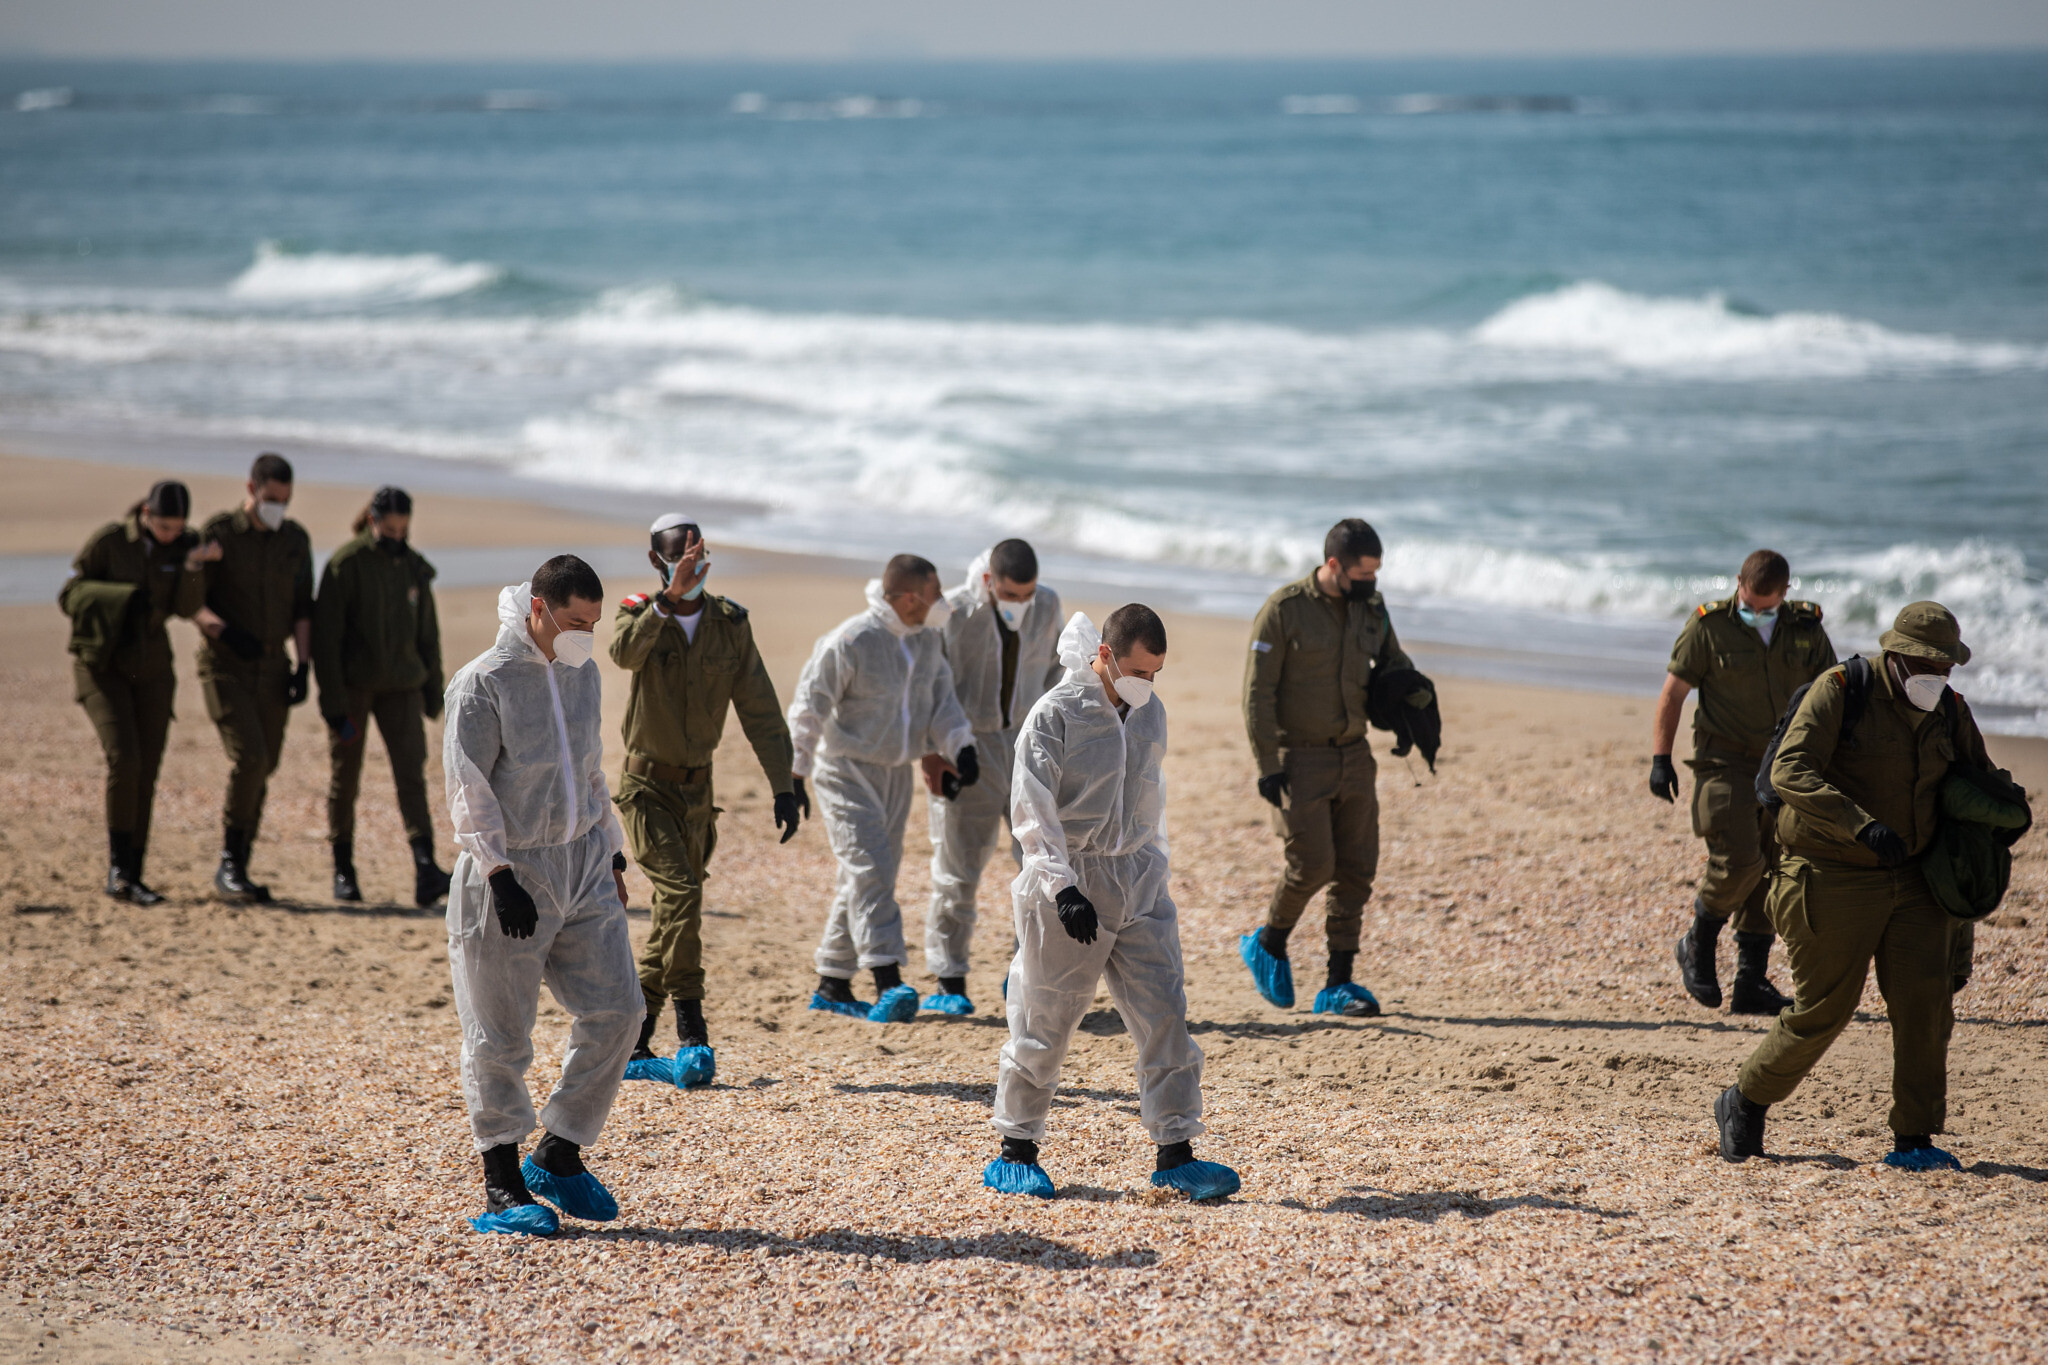 TV: No proof of attack in defense establishment probe of Iran link to oil spill